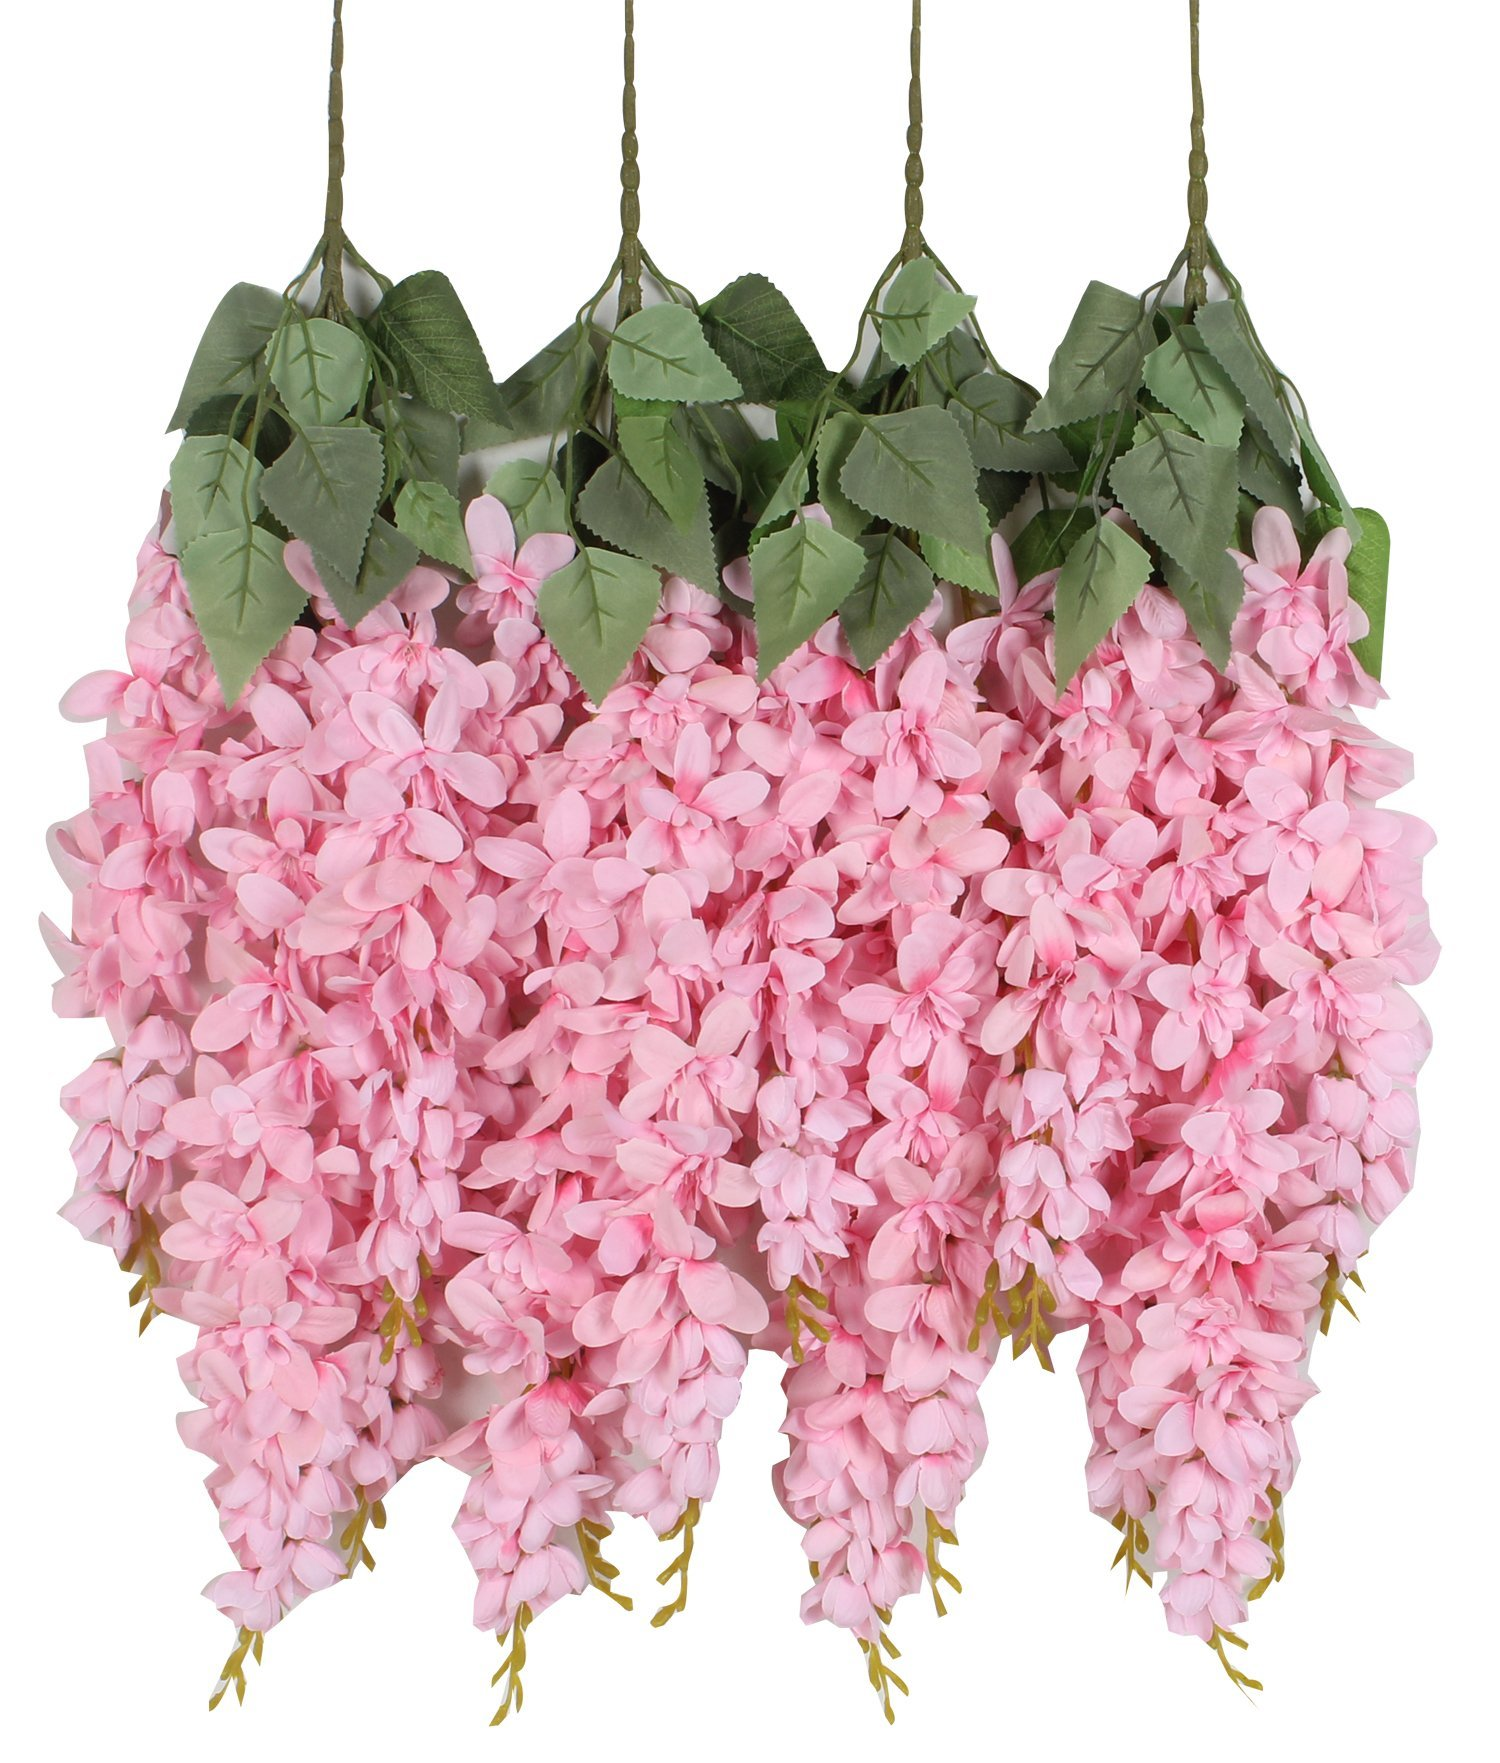 silk flower arrangements duovlo silk wisteria flower artificial 2.13 feet hanging wisteria vine fake flower bush string home party wedding decoration,pack of 4 (pink)